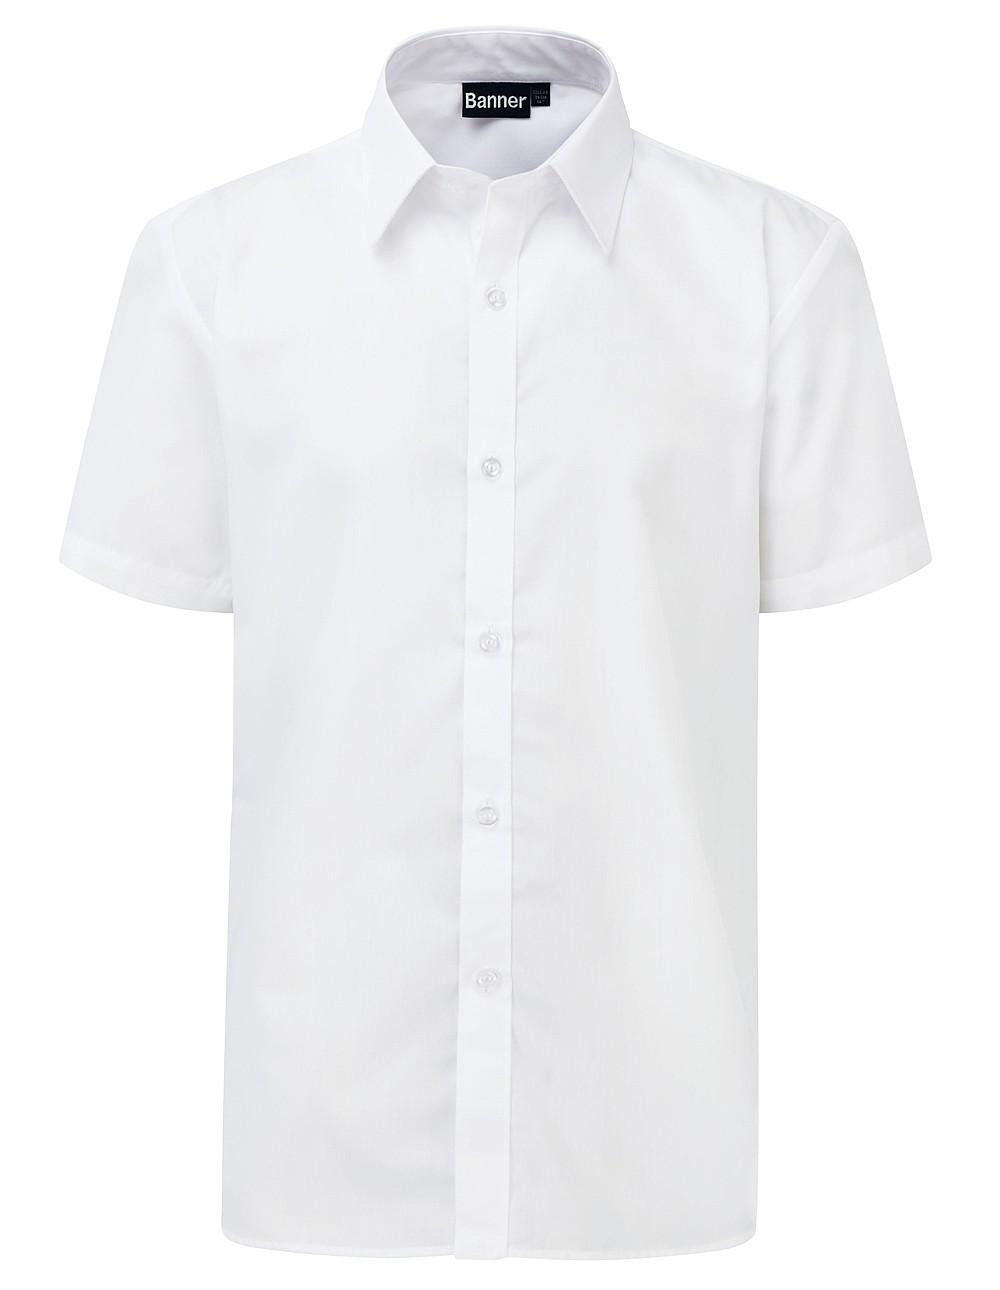 Short Sleeve Slim Fit Non Iron Shirt - Twinpack (Banner)